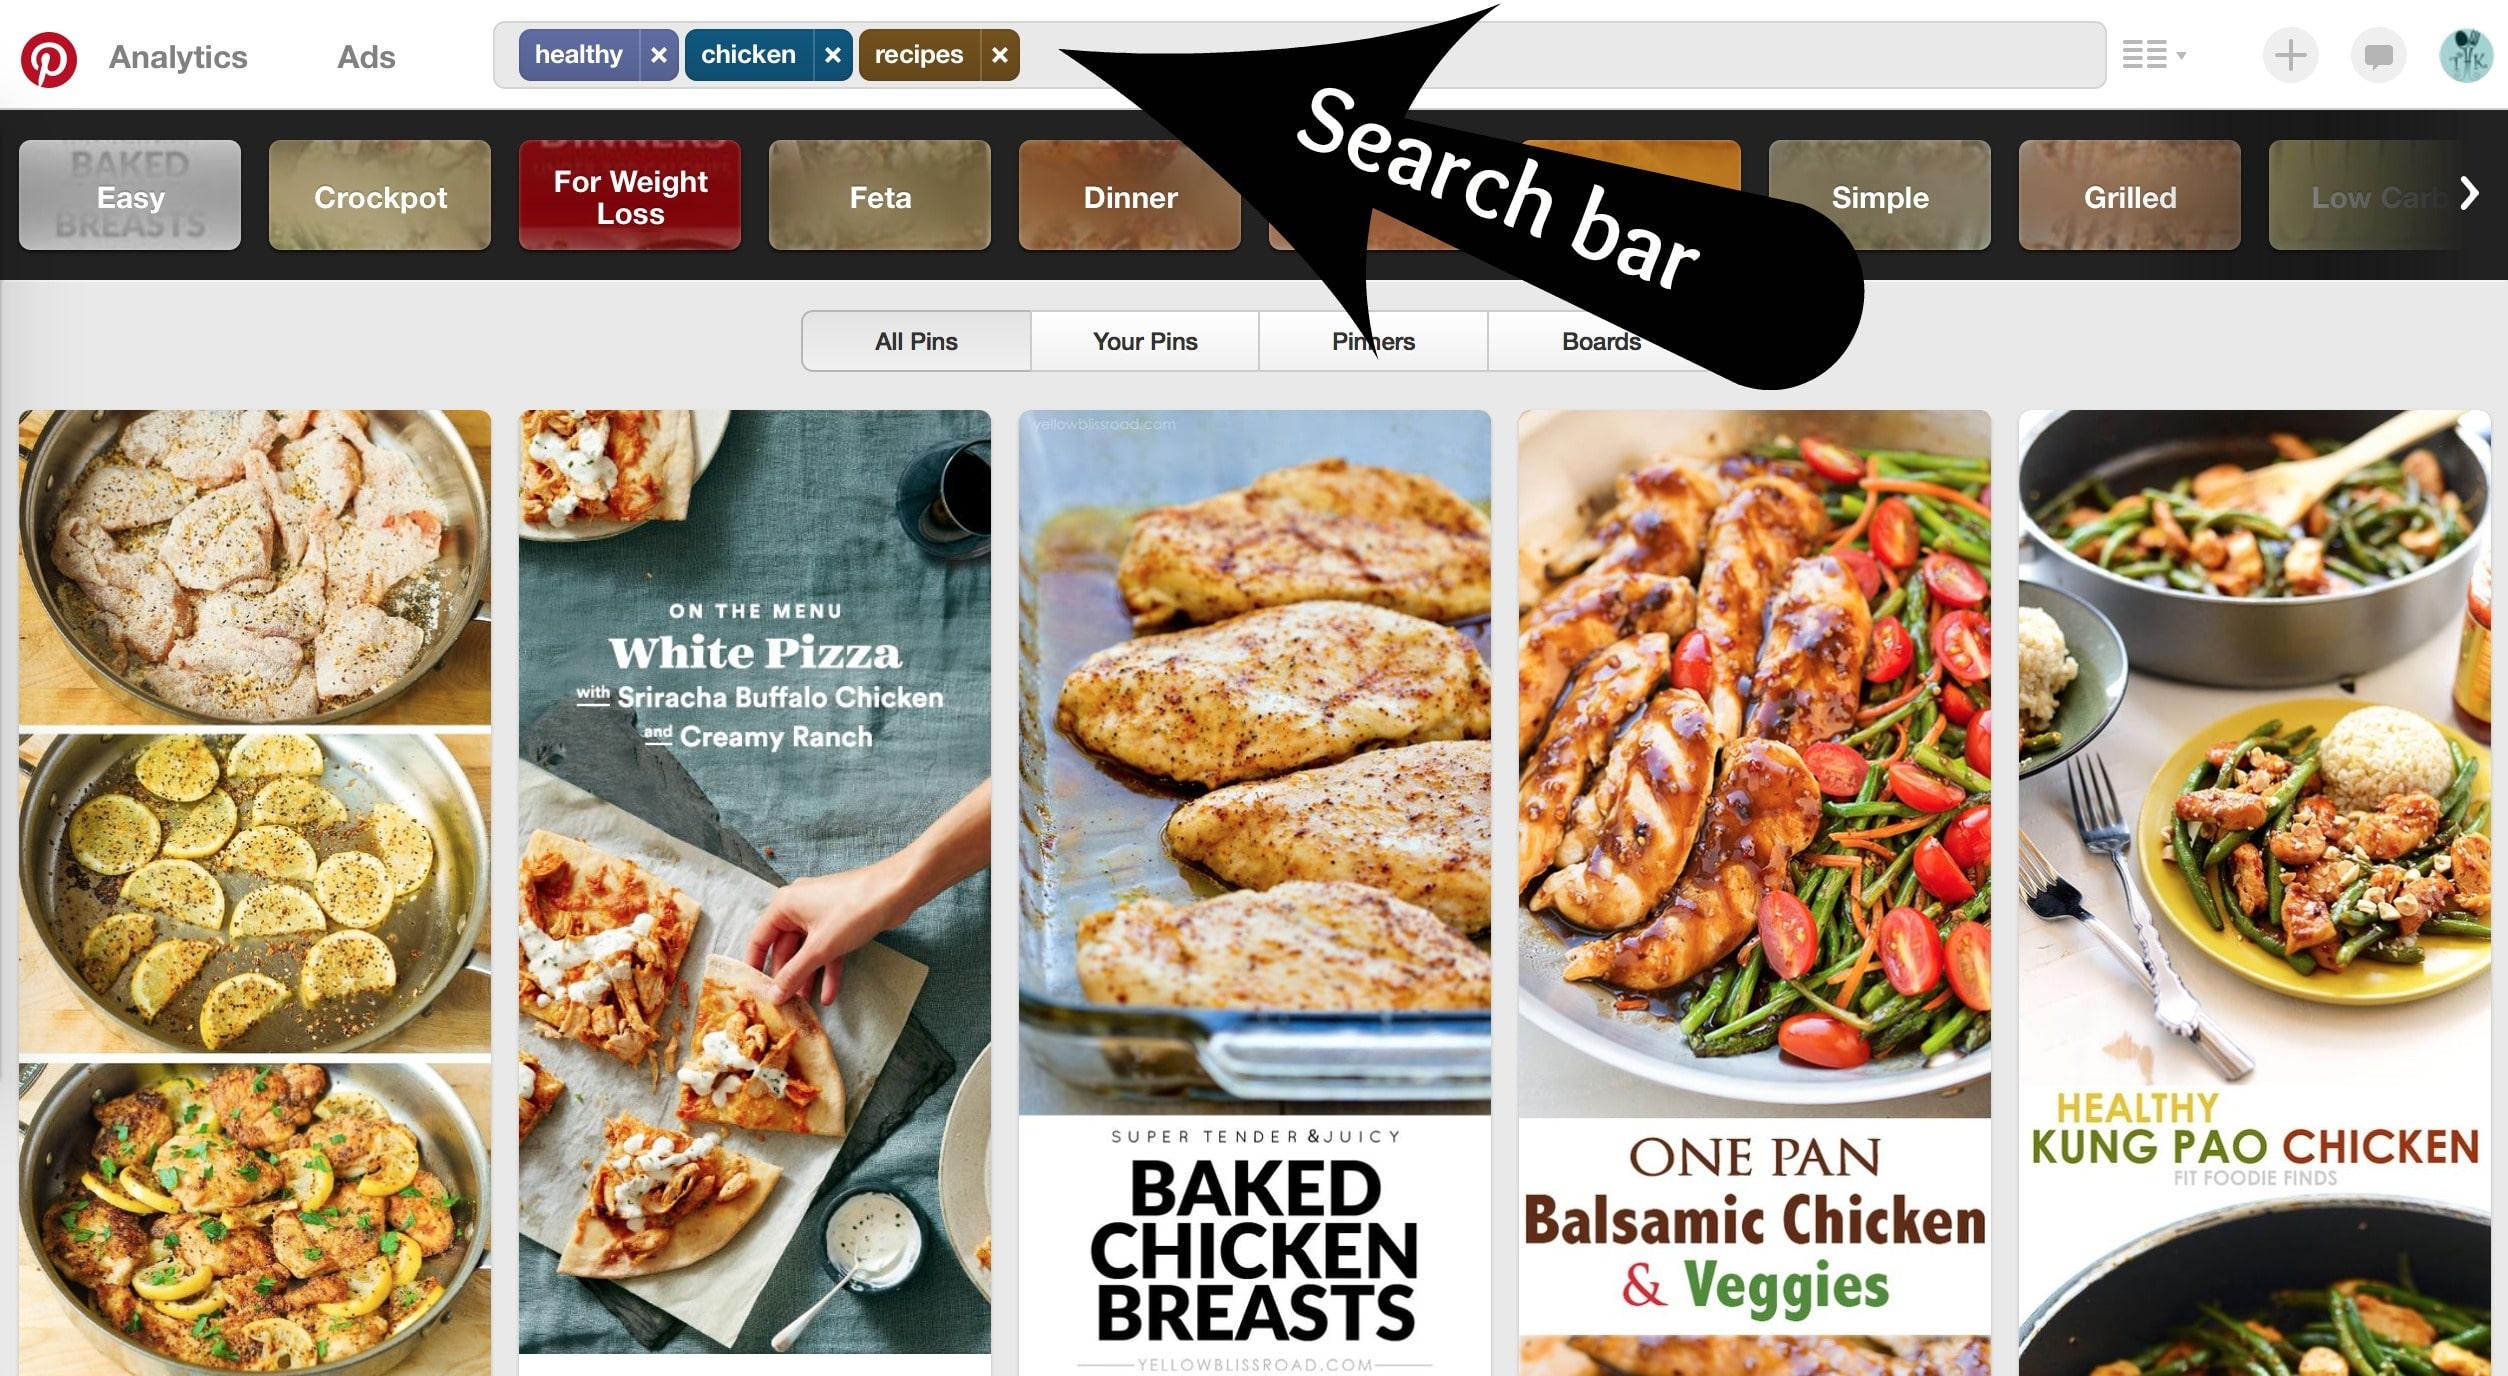 Pinterest search bar